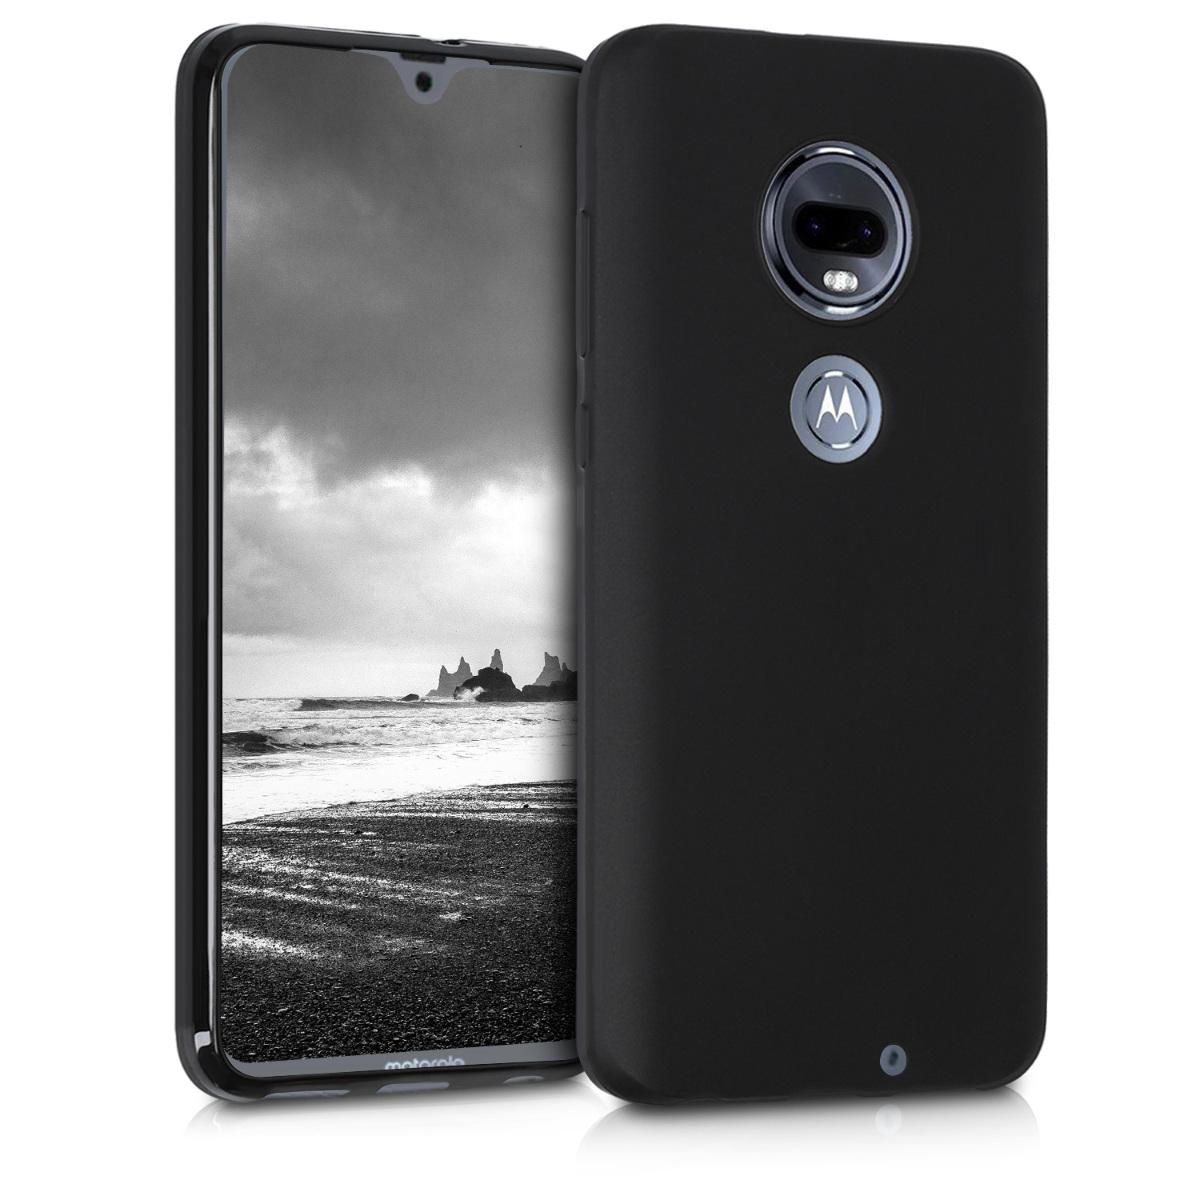 KW Θήκη Σιλικόνης Motorola Moto G7 - Black Matte (47484.47)